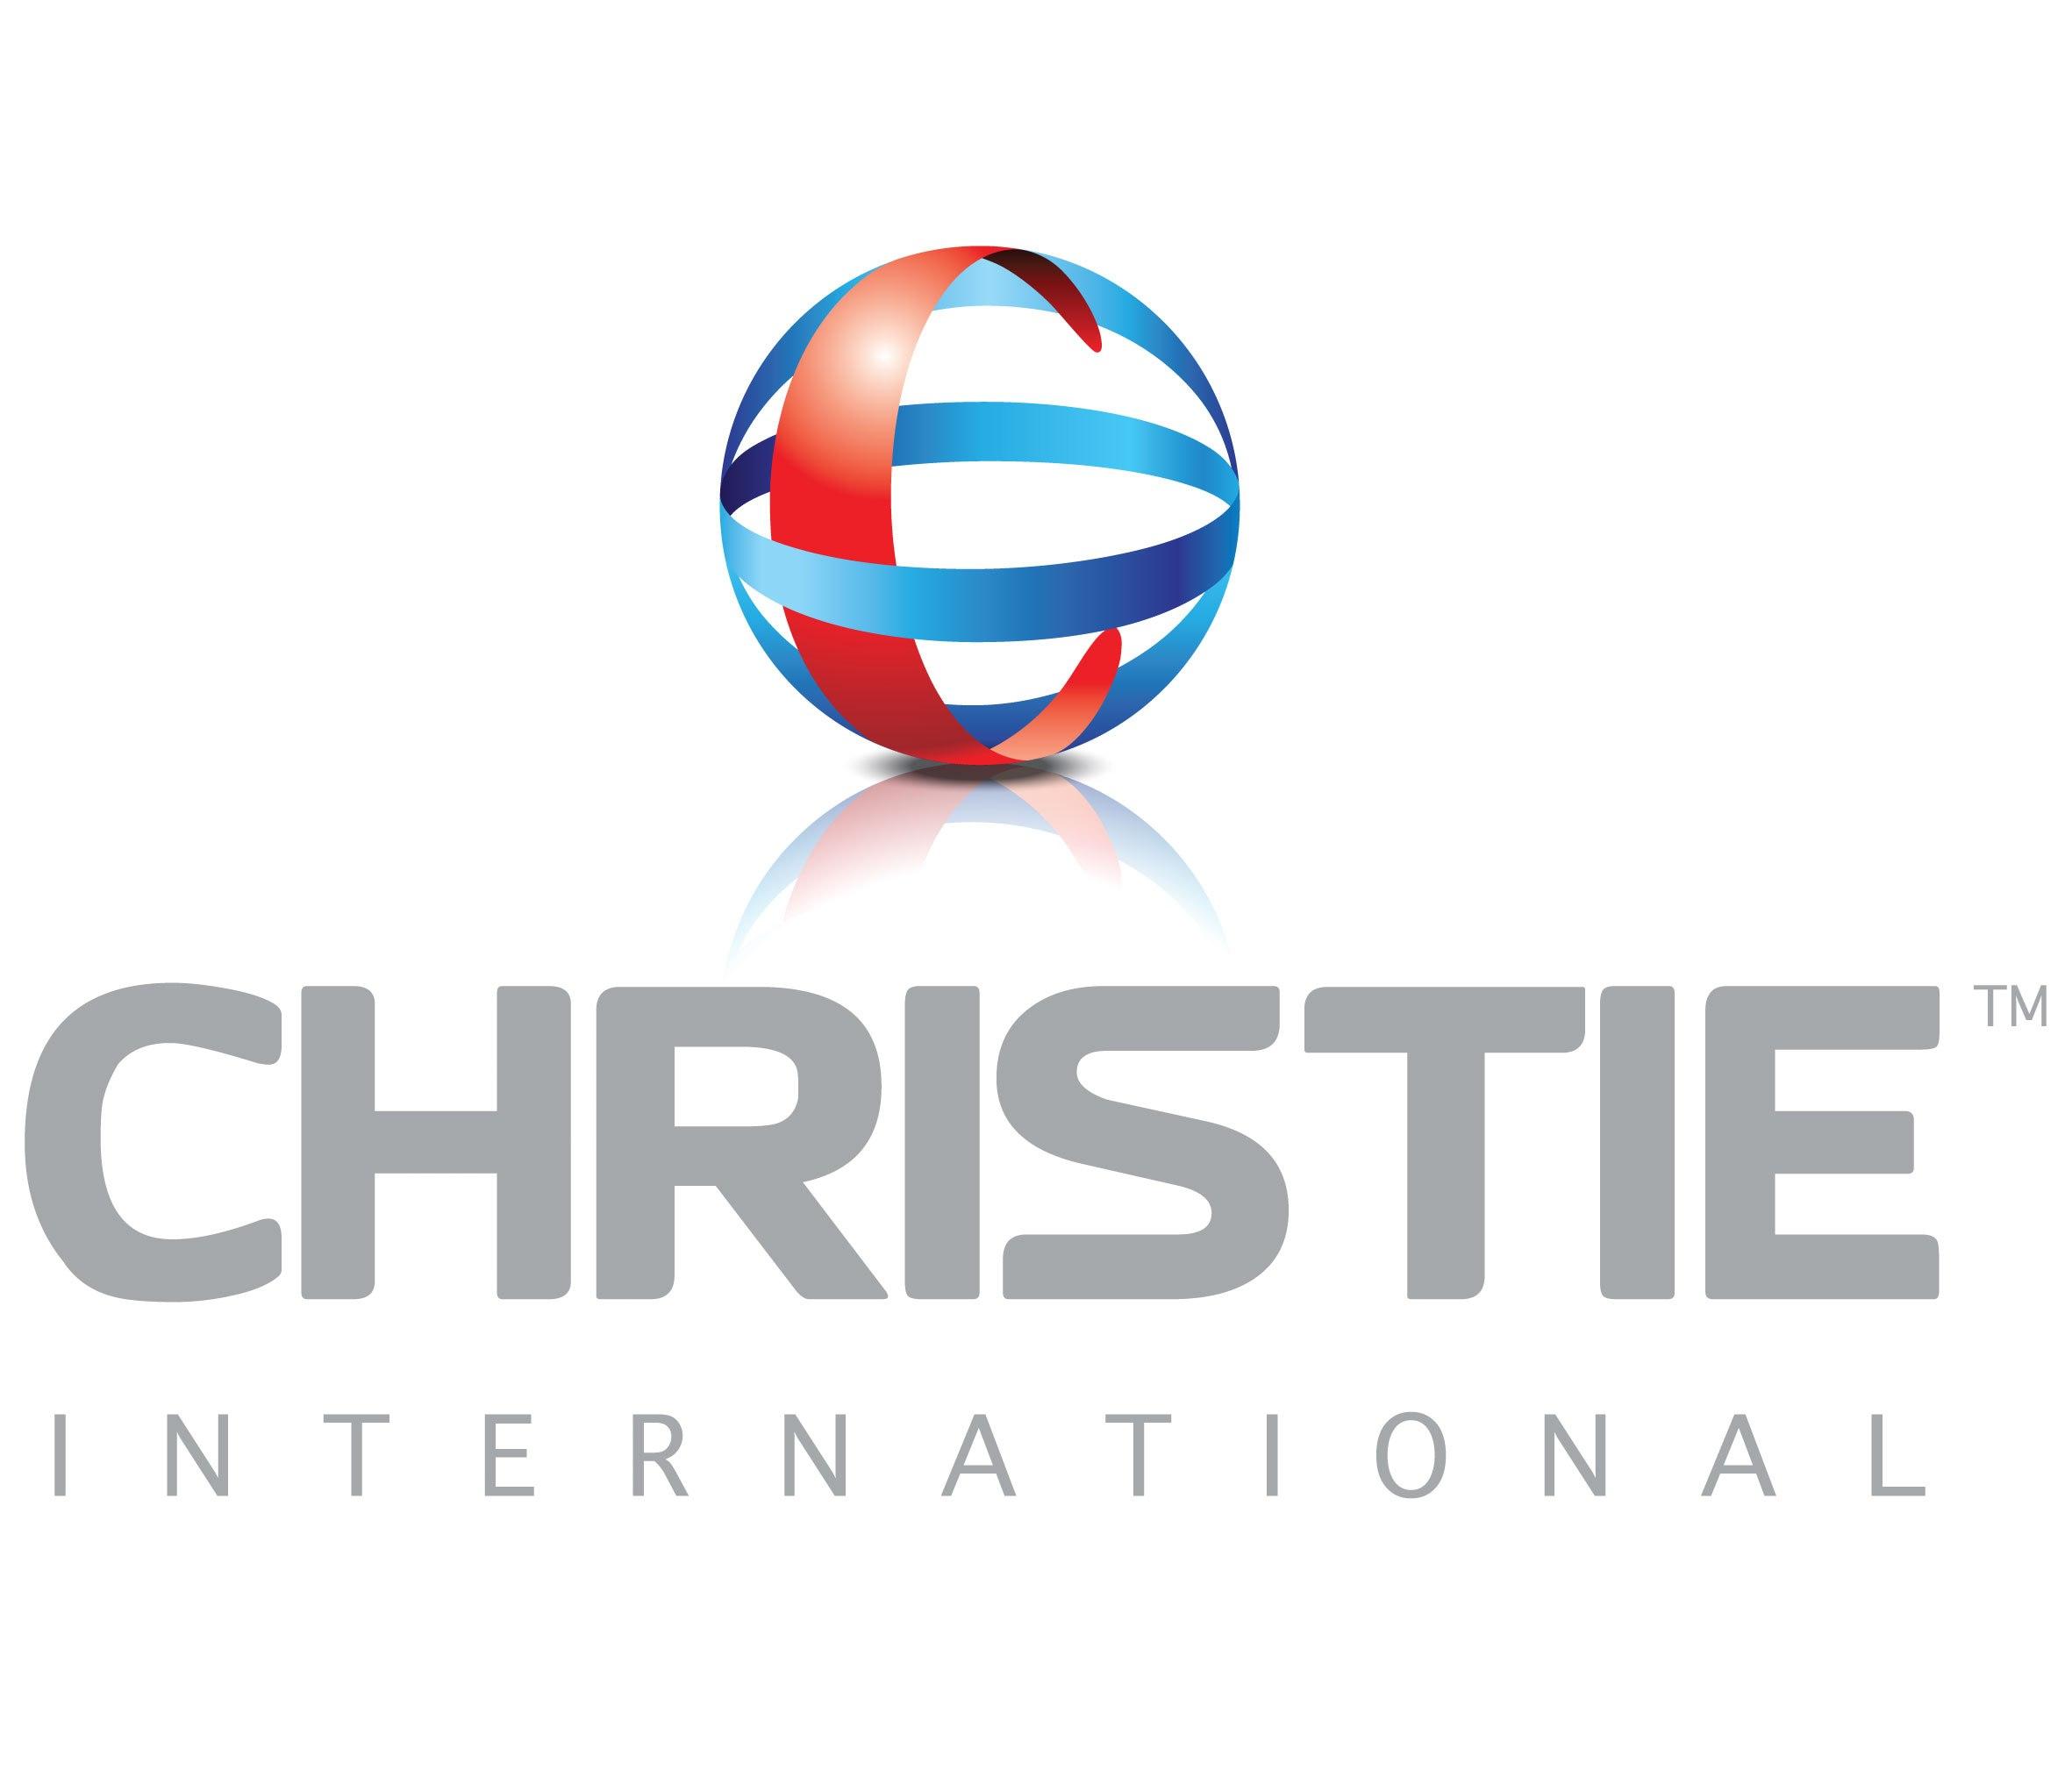 Christie_Logo.jpg